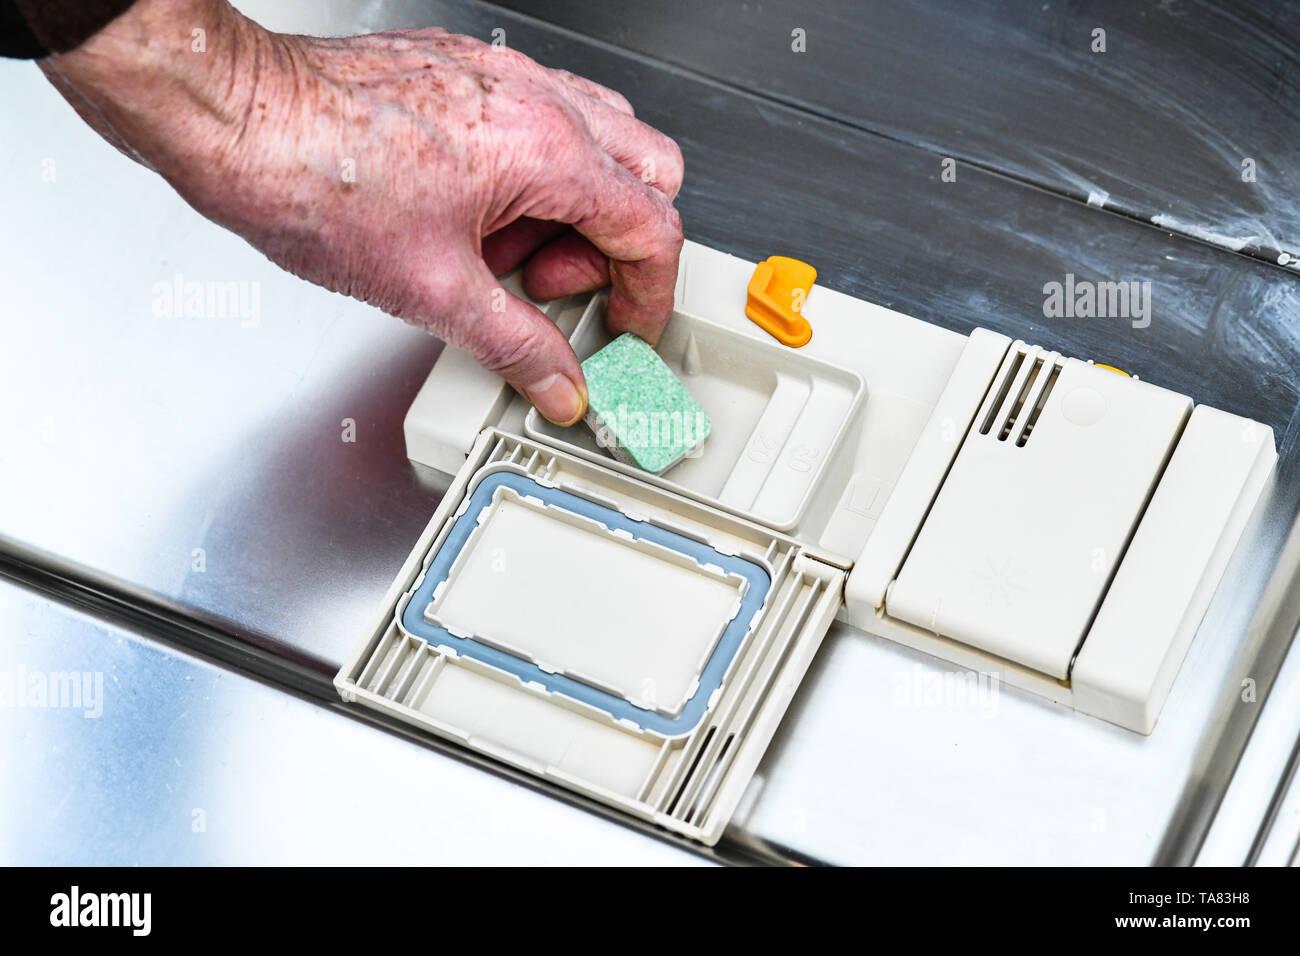 Tab., lavavajillas, Ficha Geschirrspülmaschine Foto de stock